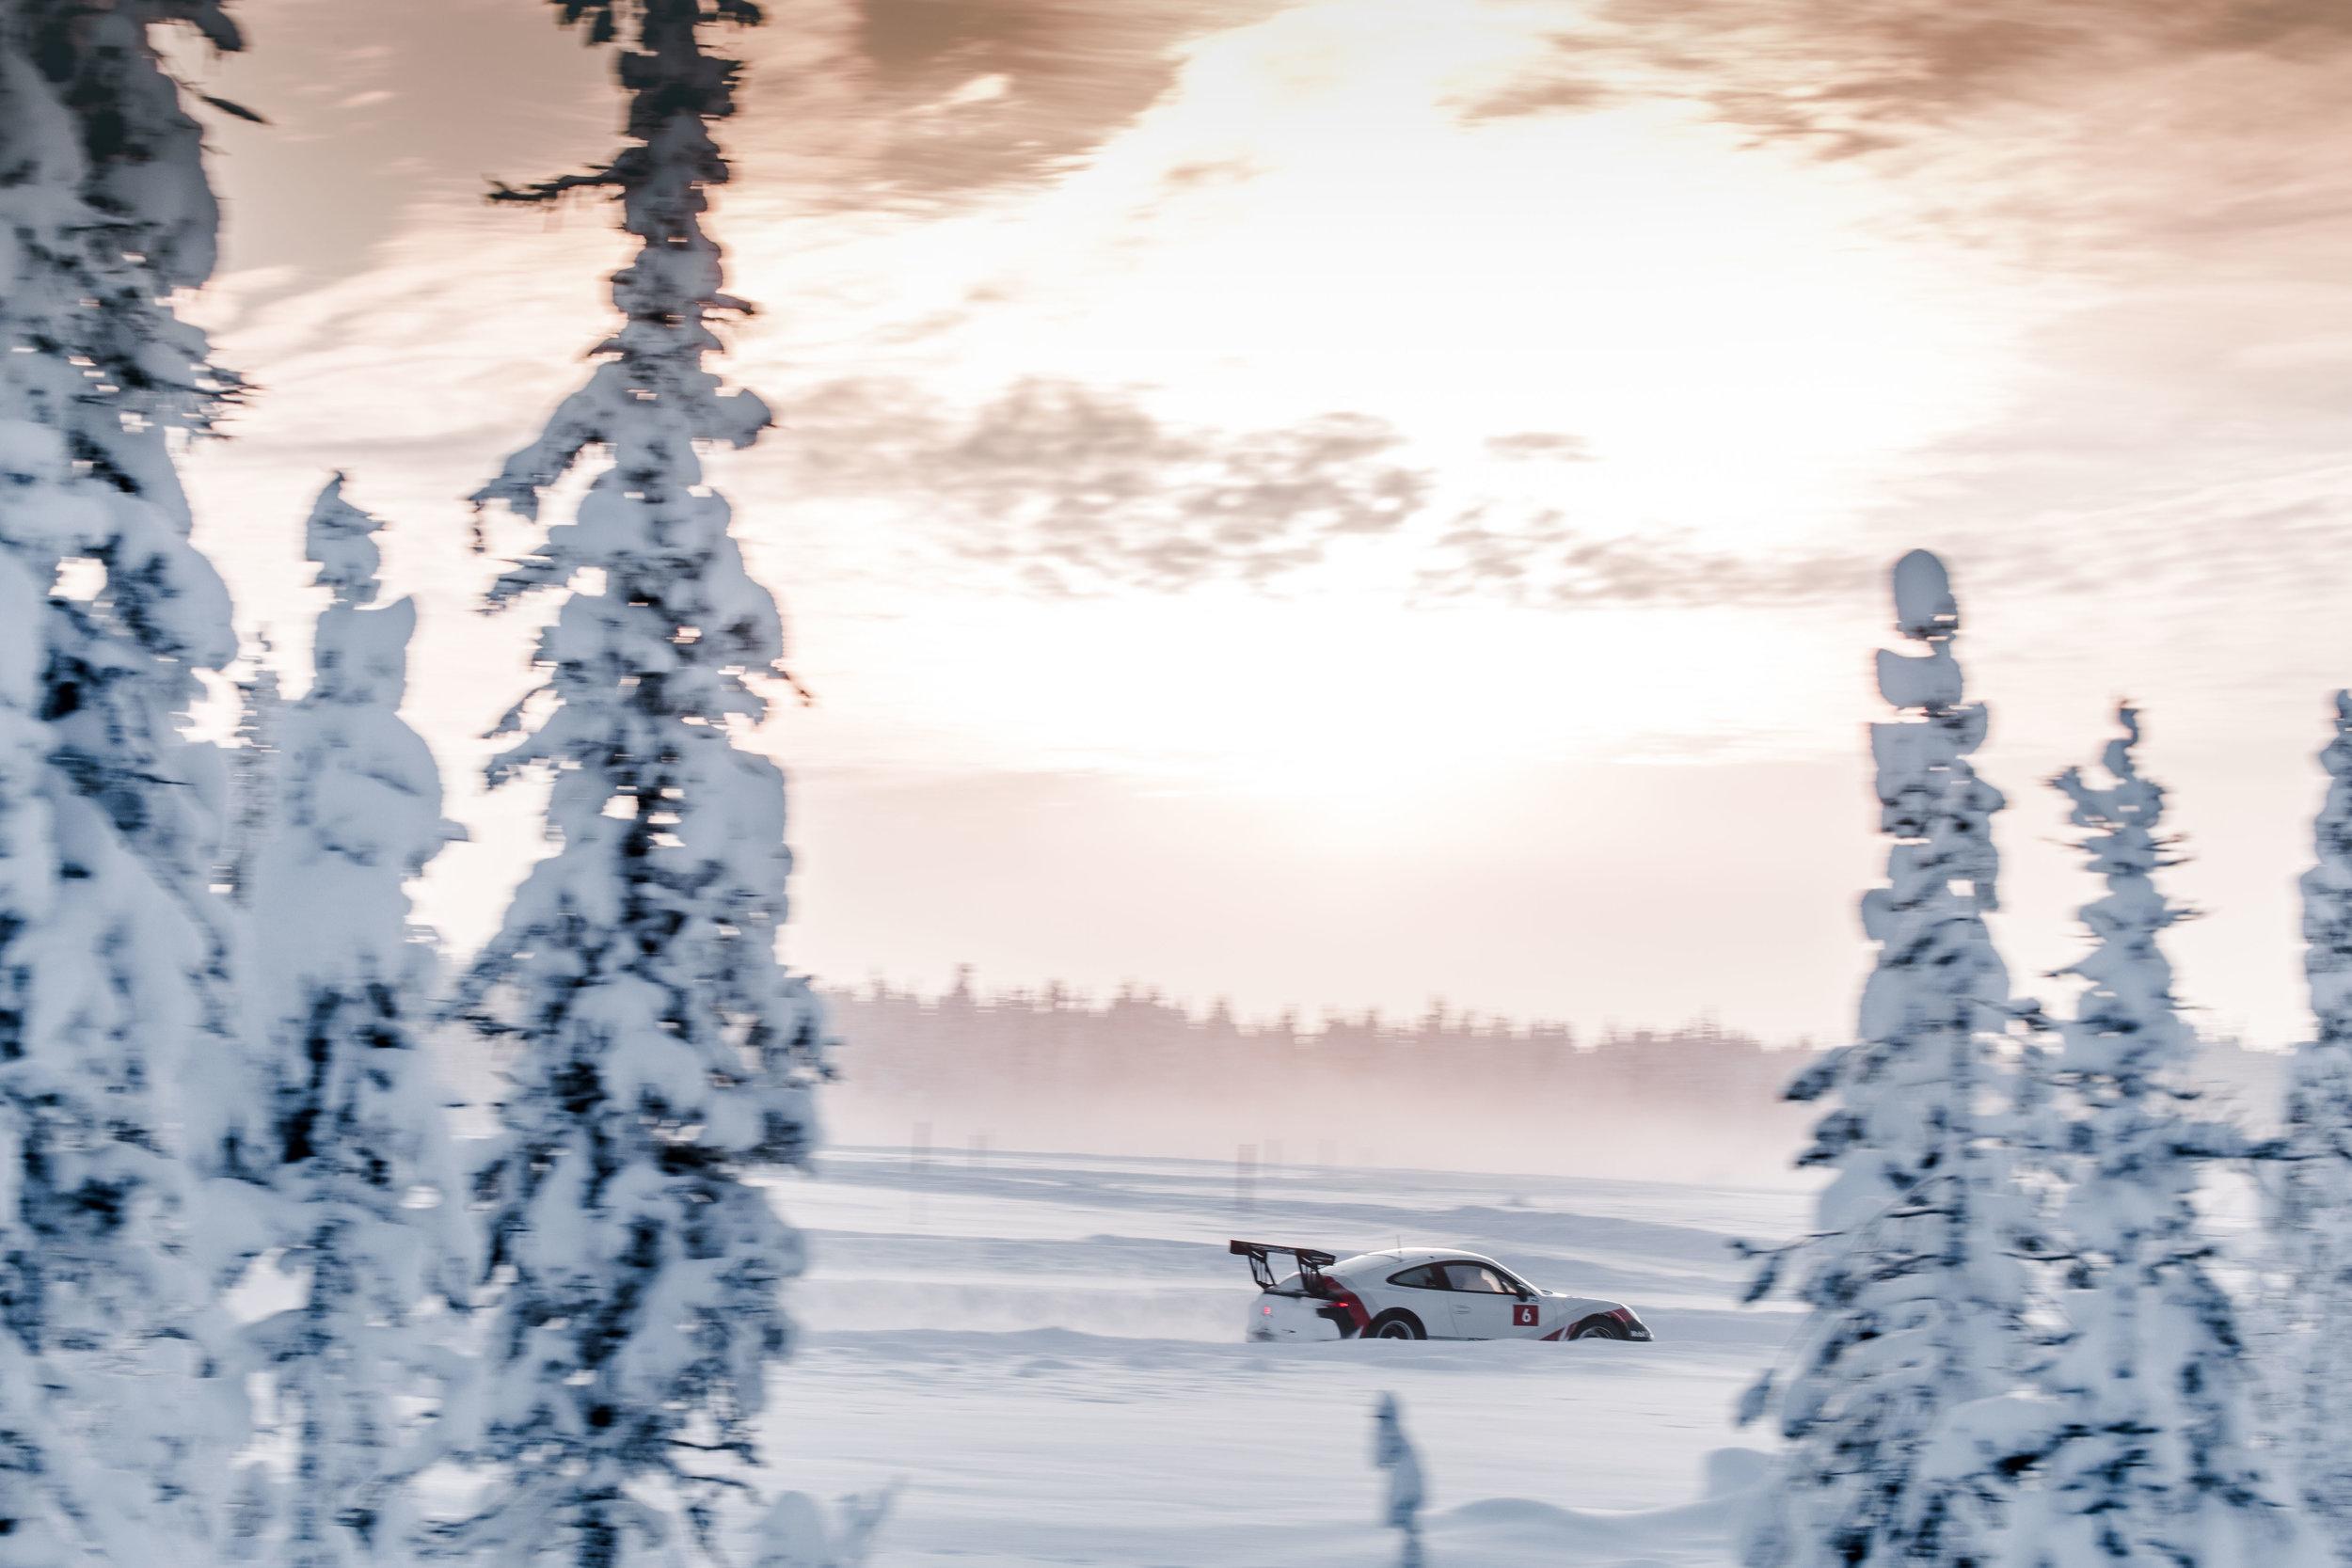 Porsche Ice Experience on Ice_30_01_2019_1371_175814.jpg